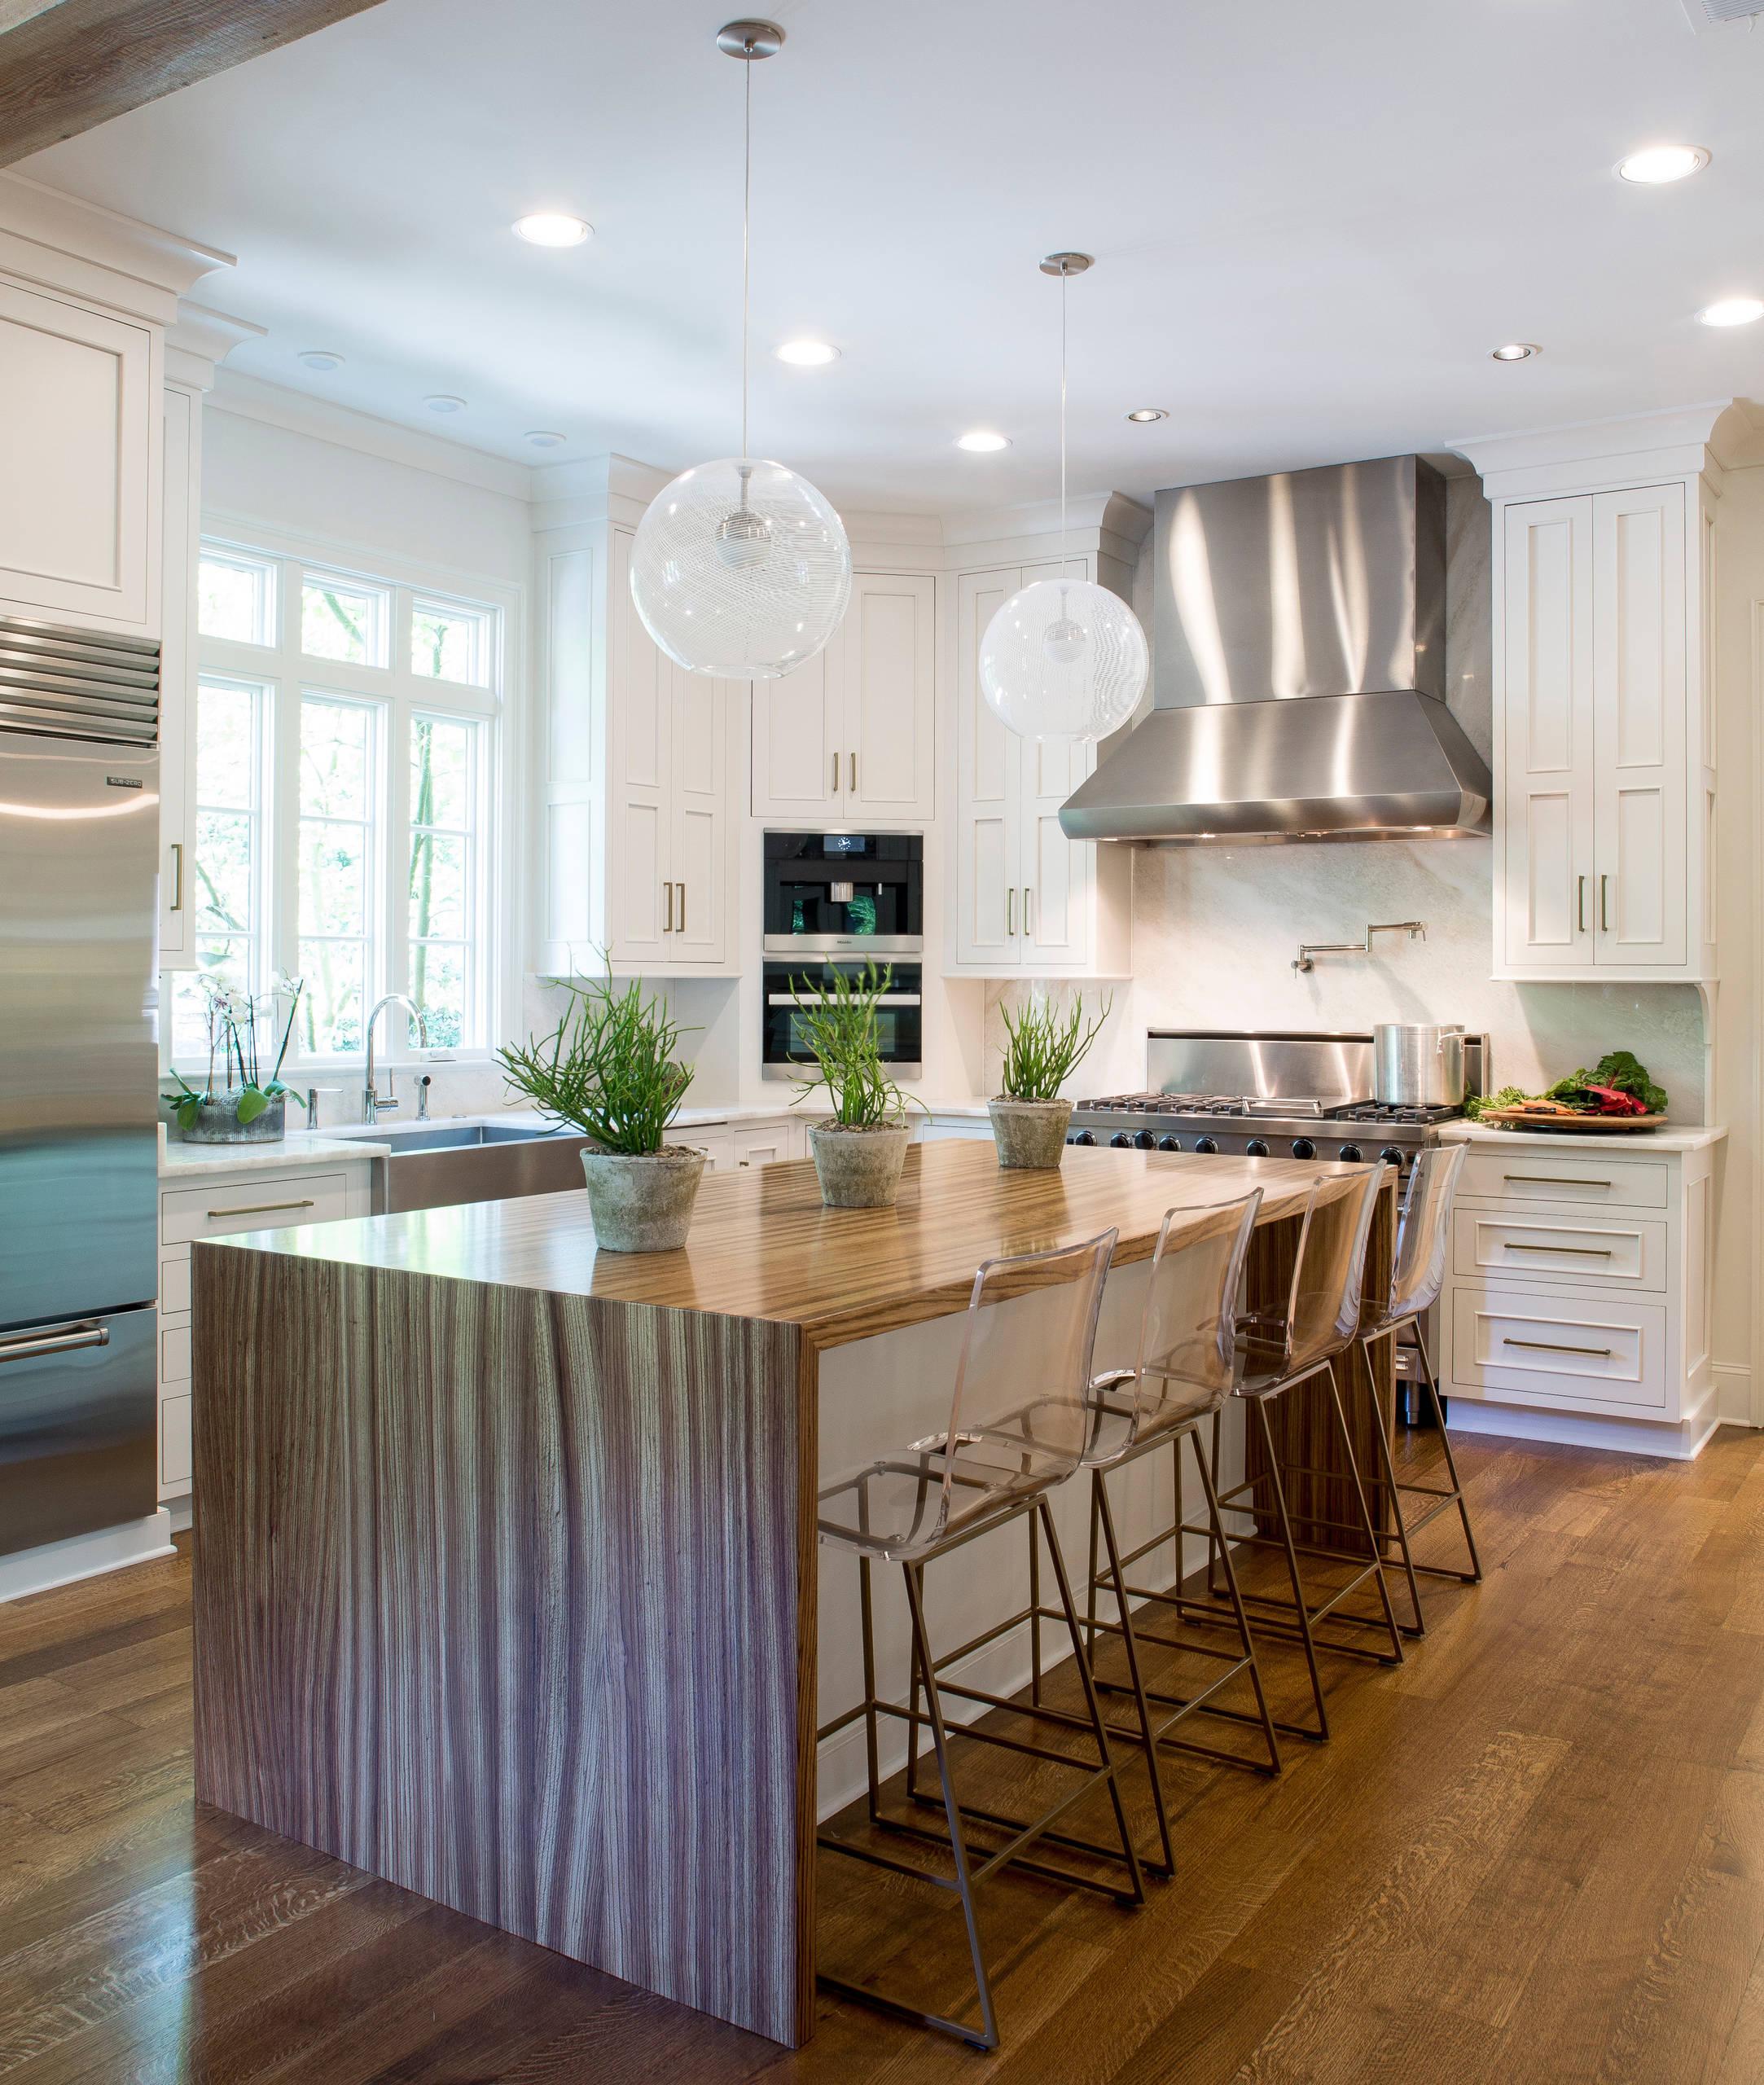 4x4 Corner Pantry Kitchen Ideas Photos Houzz